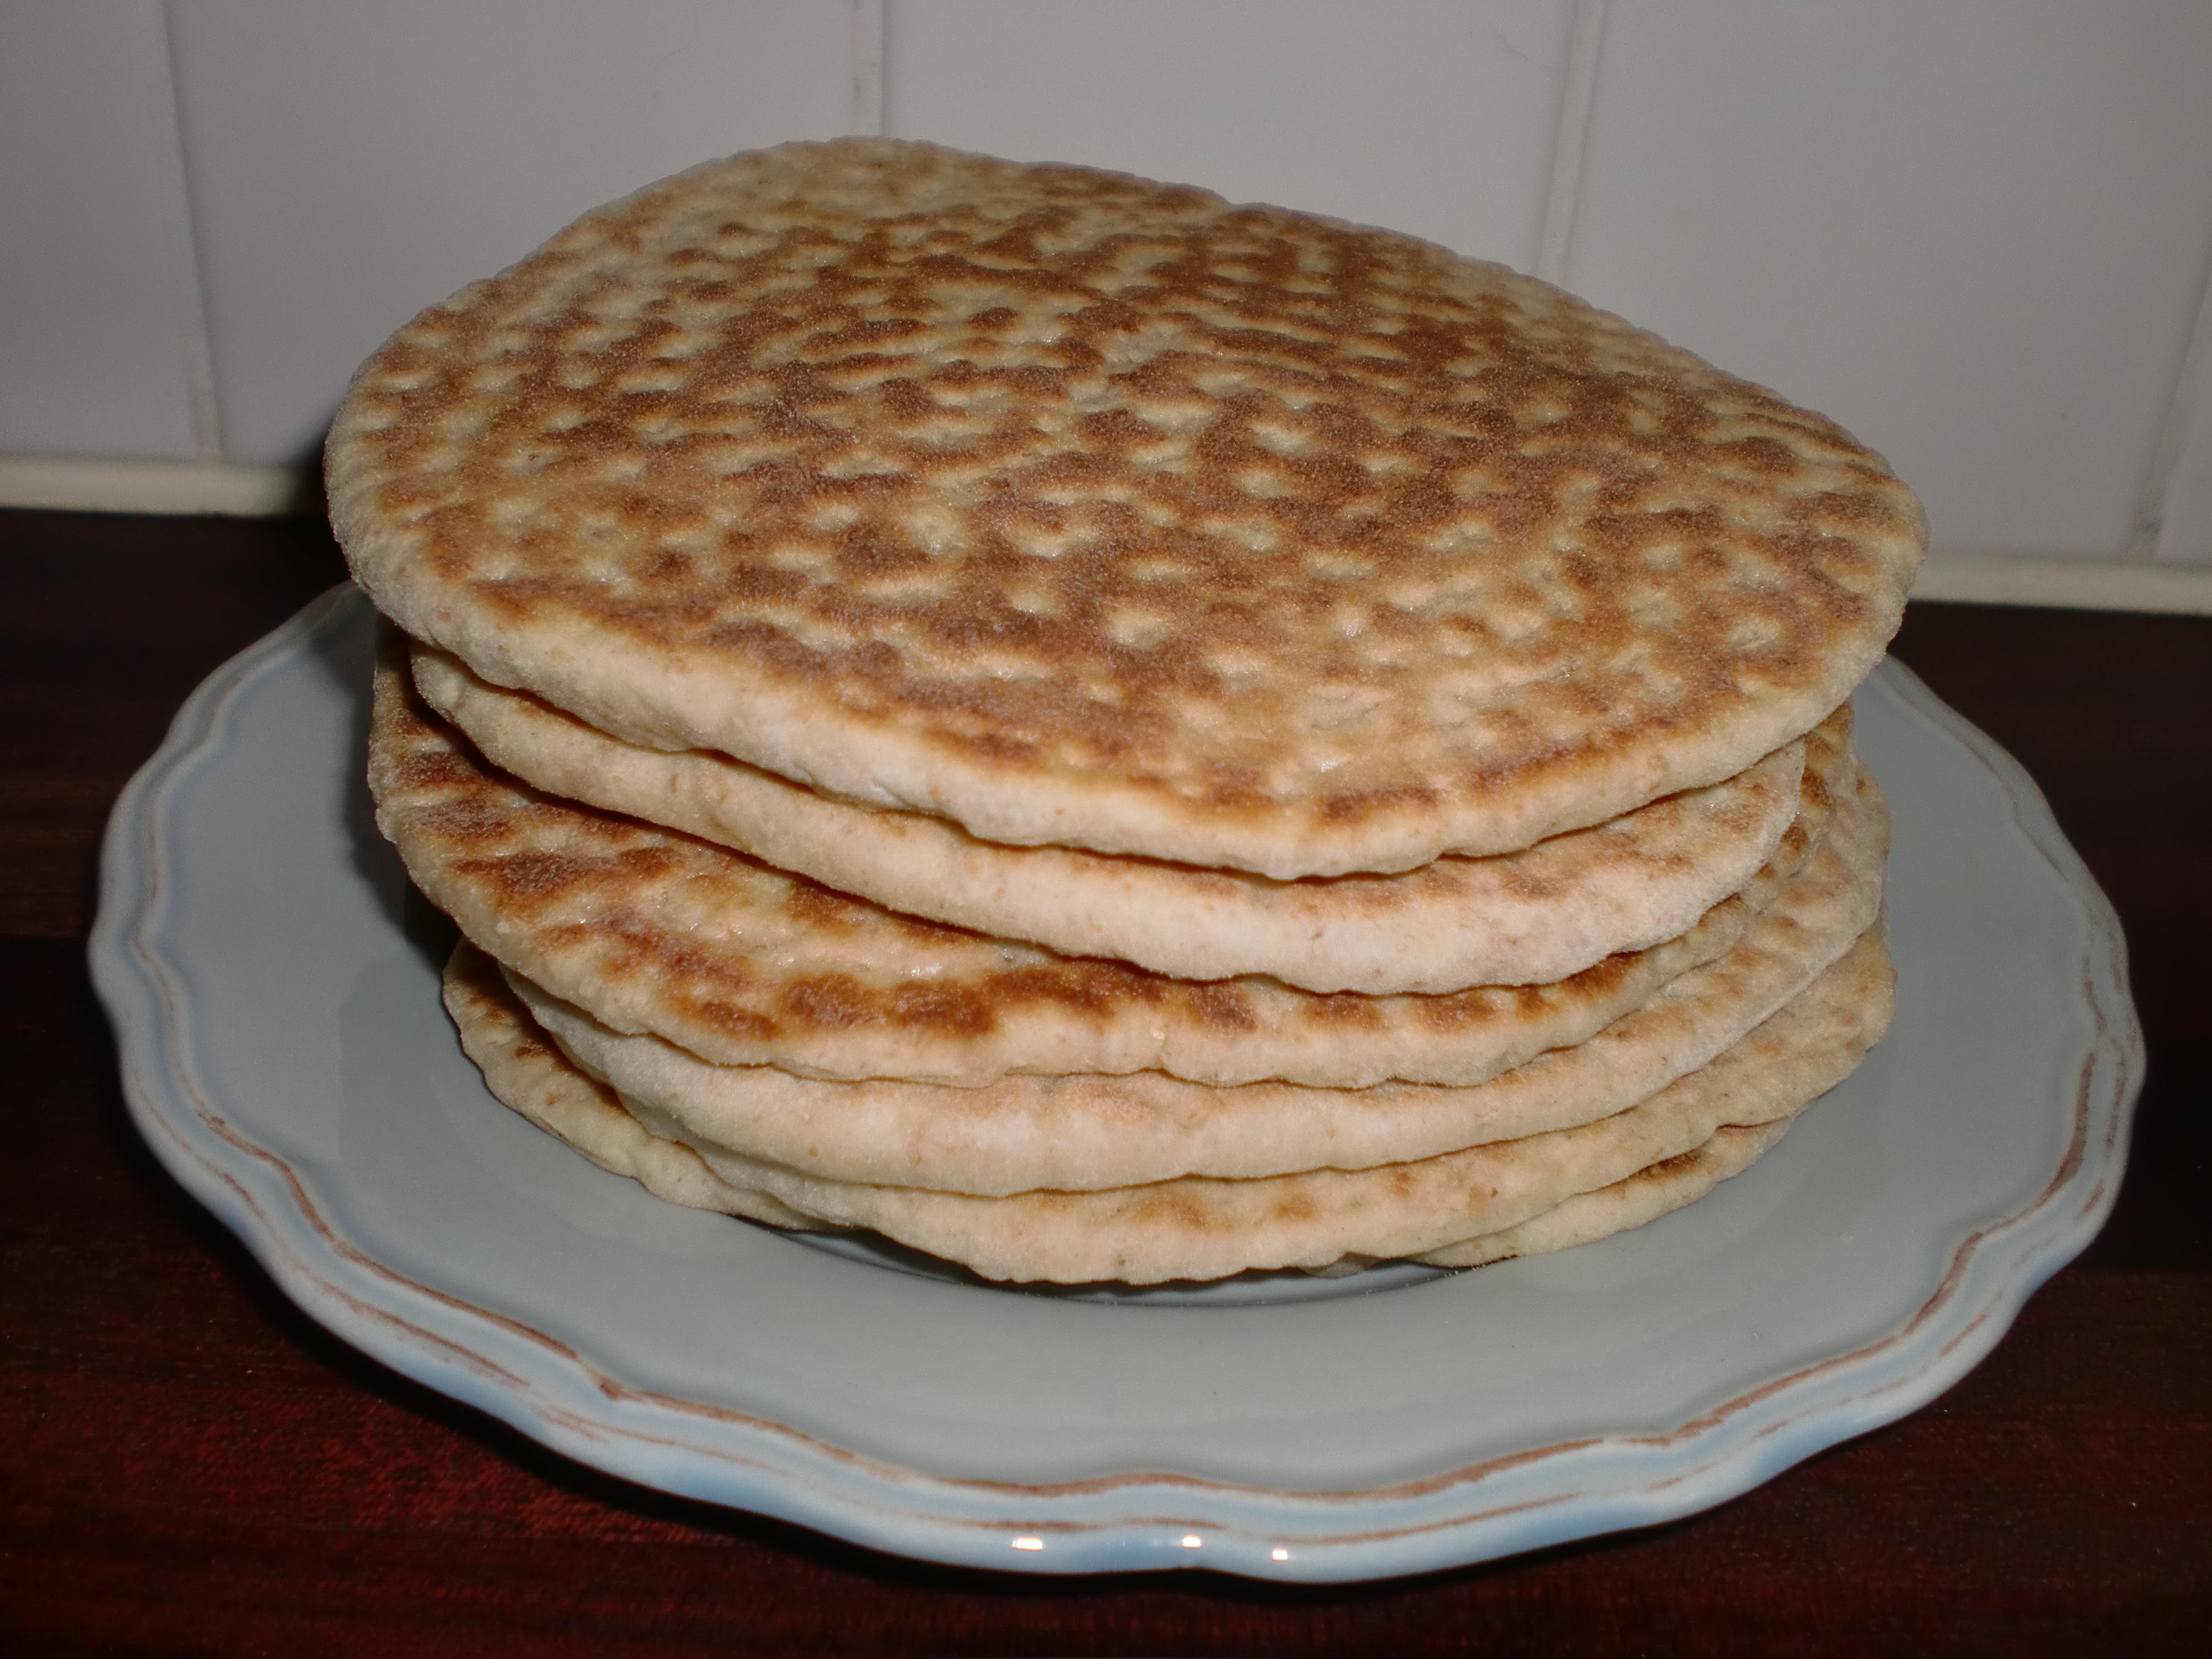 Traditionell mjukkaka - i stekpanna